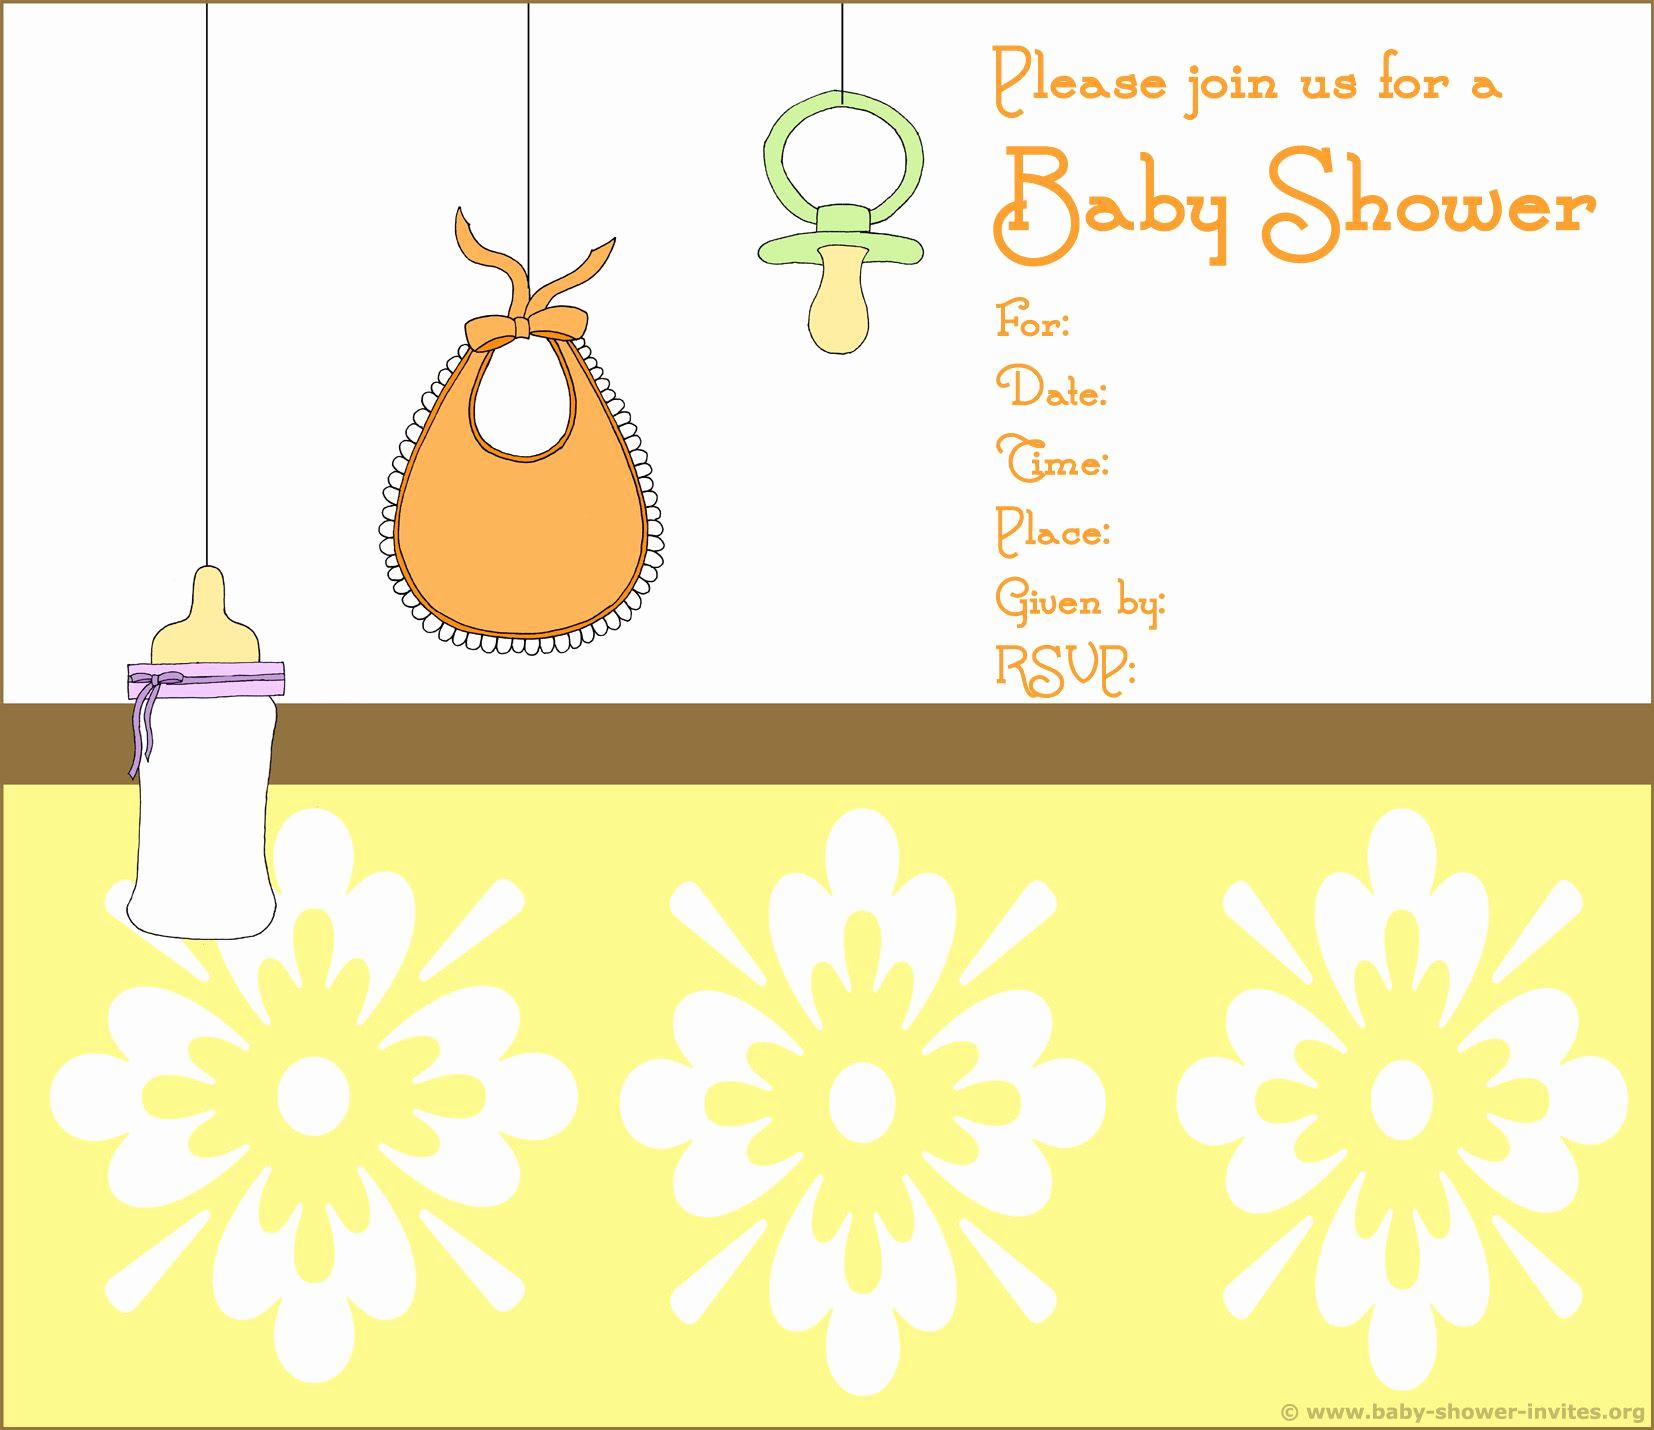 Baby Shower Invitation Border Inspirational Printable Baby Shower Invitations Free Printable Bee